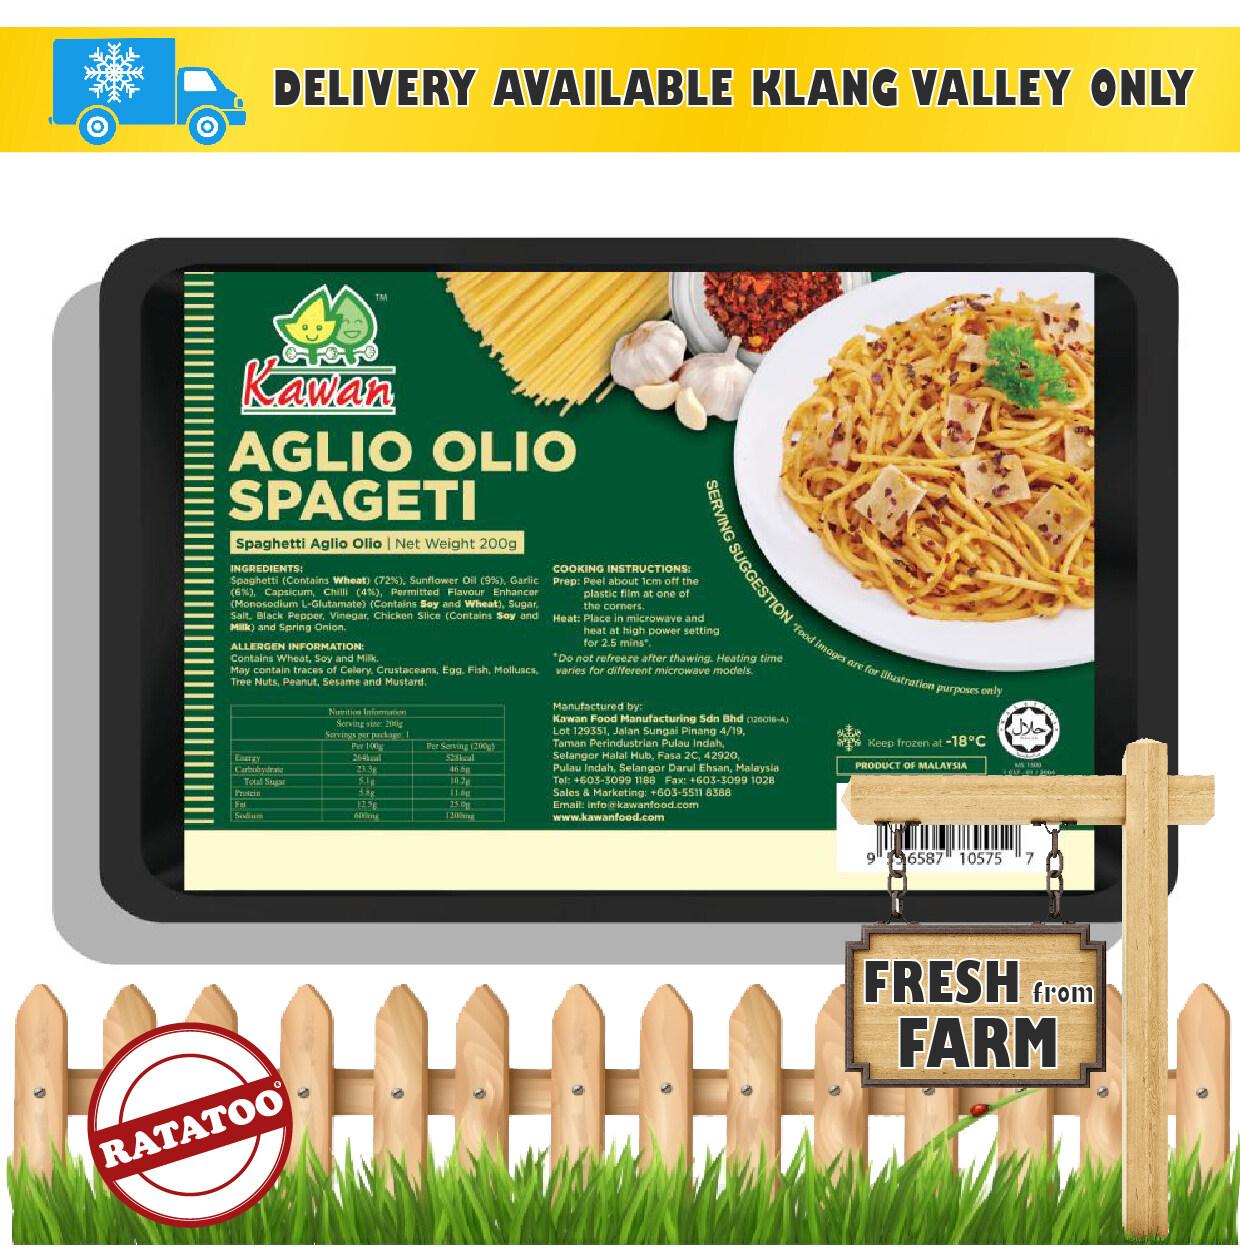 [SALE] Microwave Meal Kawan Aglio Olio Spaghetti 200g RATATOO MARKET